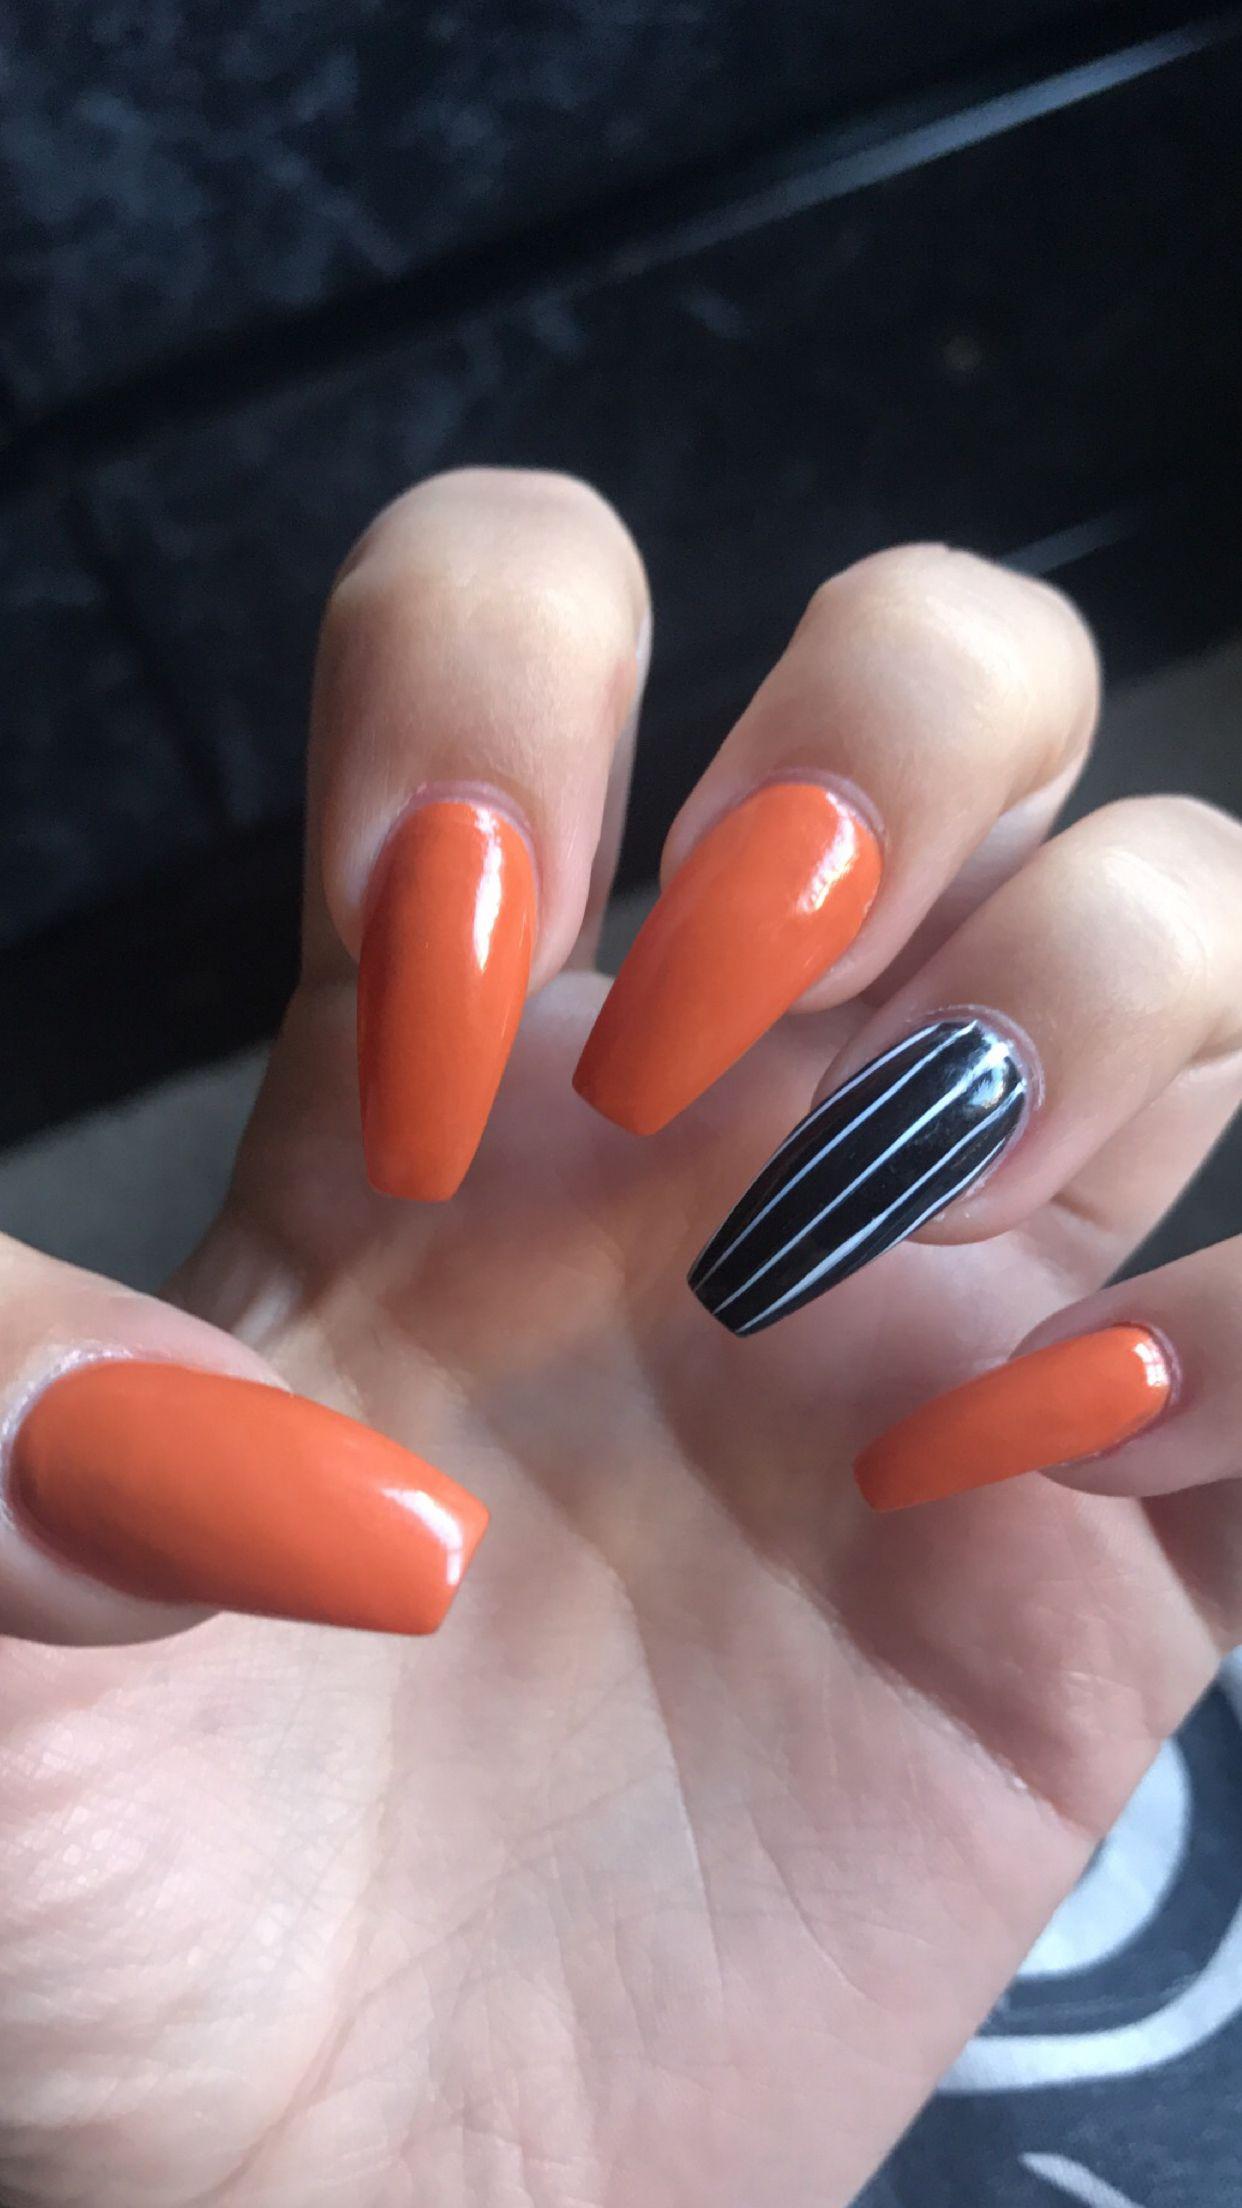 Halloween nails | Manicura de uñas, Uñas garra, Bonitas uñas